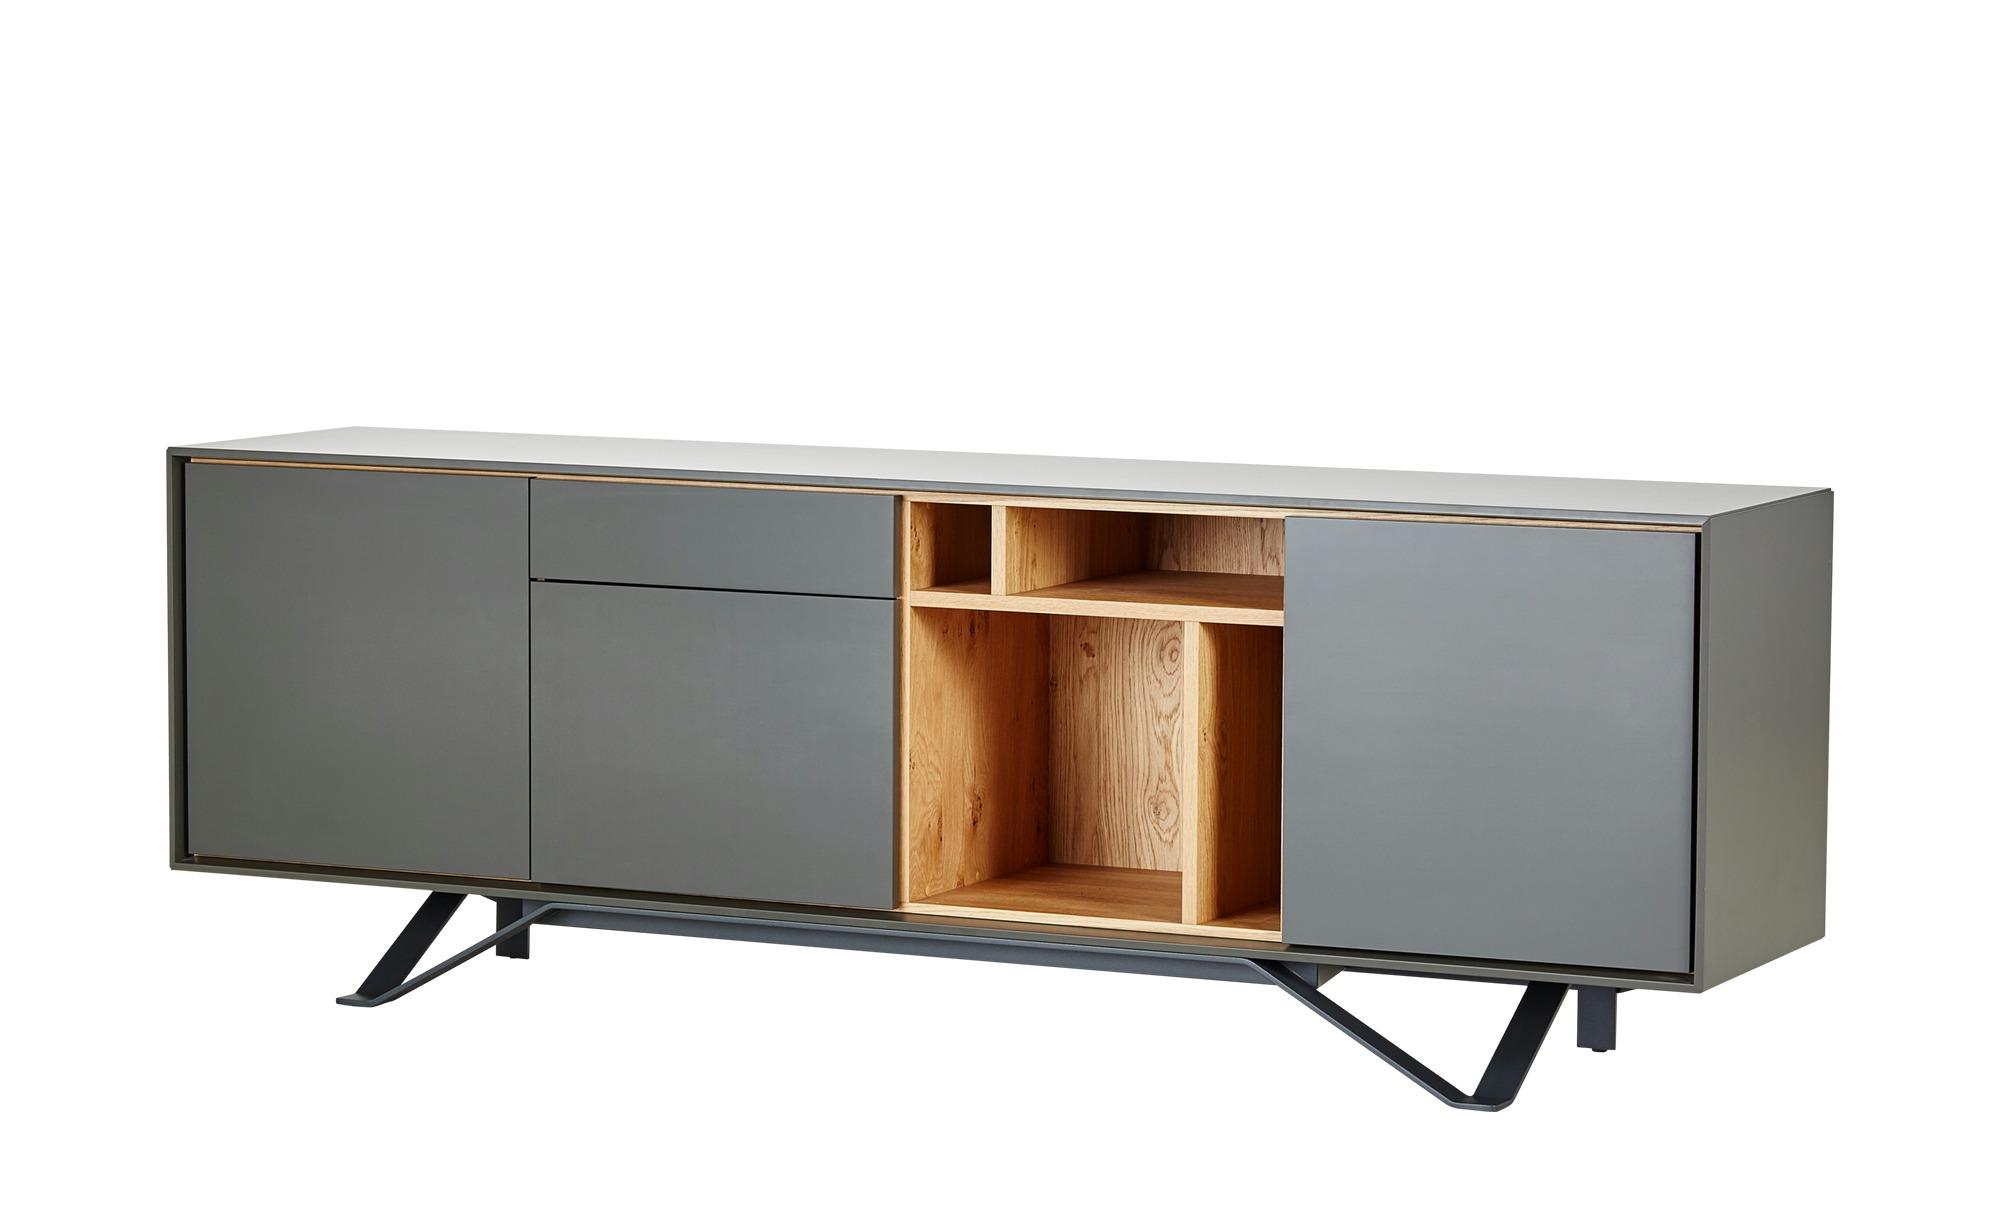 hülsta Sideboard  Scopia ¦ Maße (cm): B: 209 H: 72 T: 47 Kommoden & Sideboards > Sideboards - Höffner